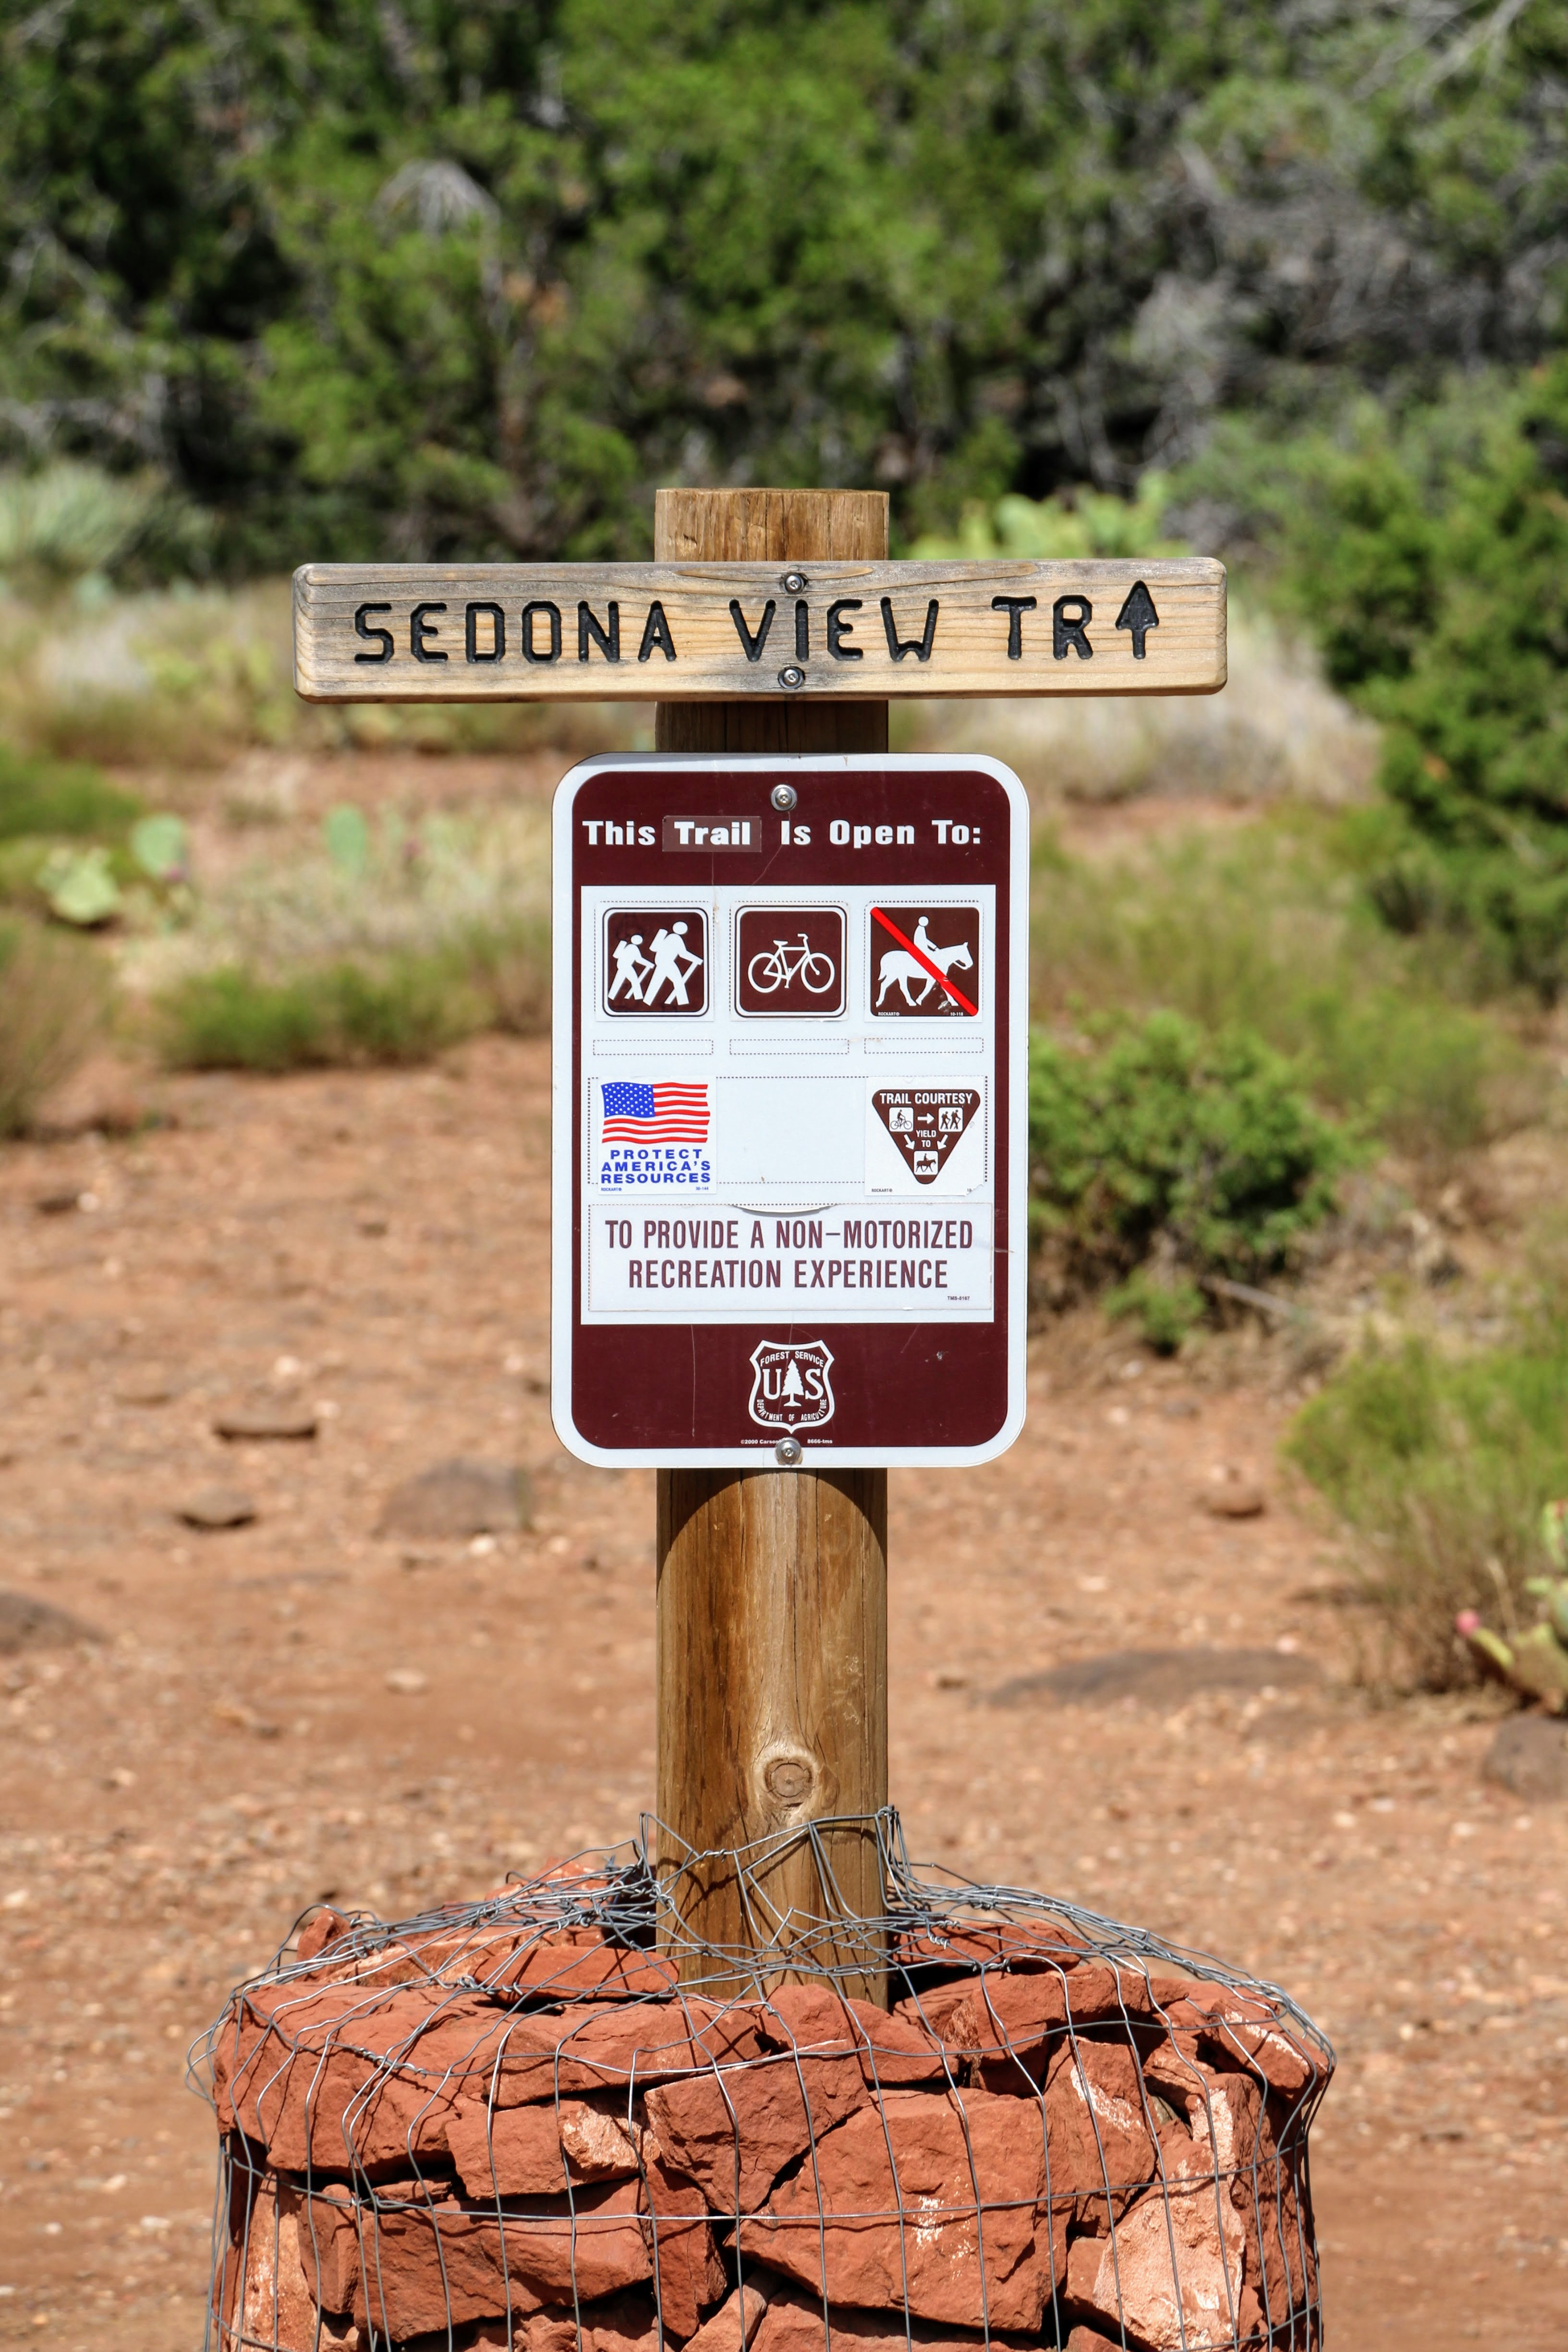 Sedona view trail